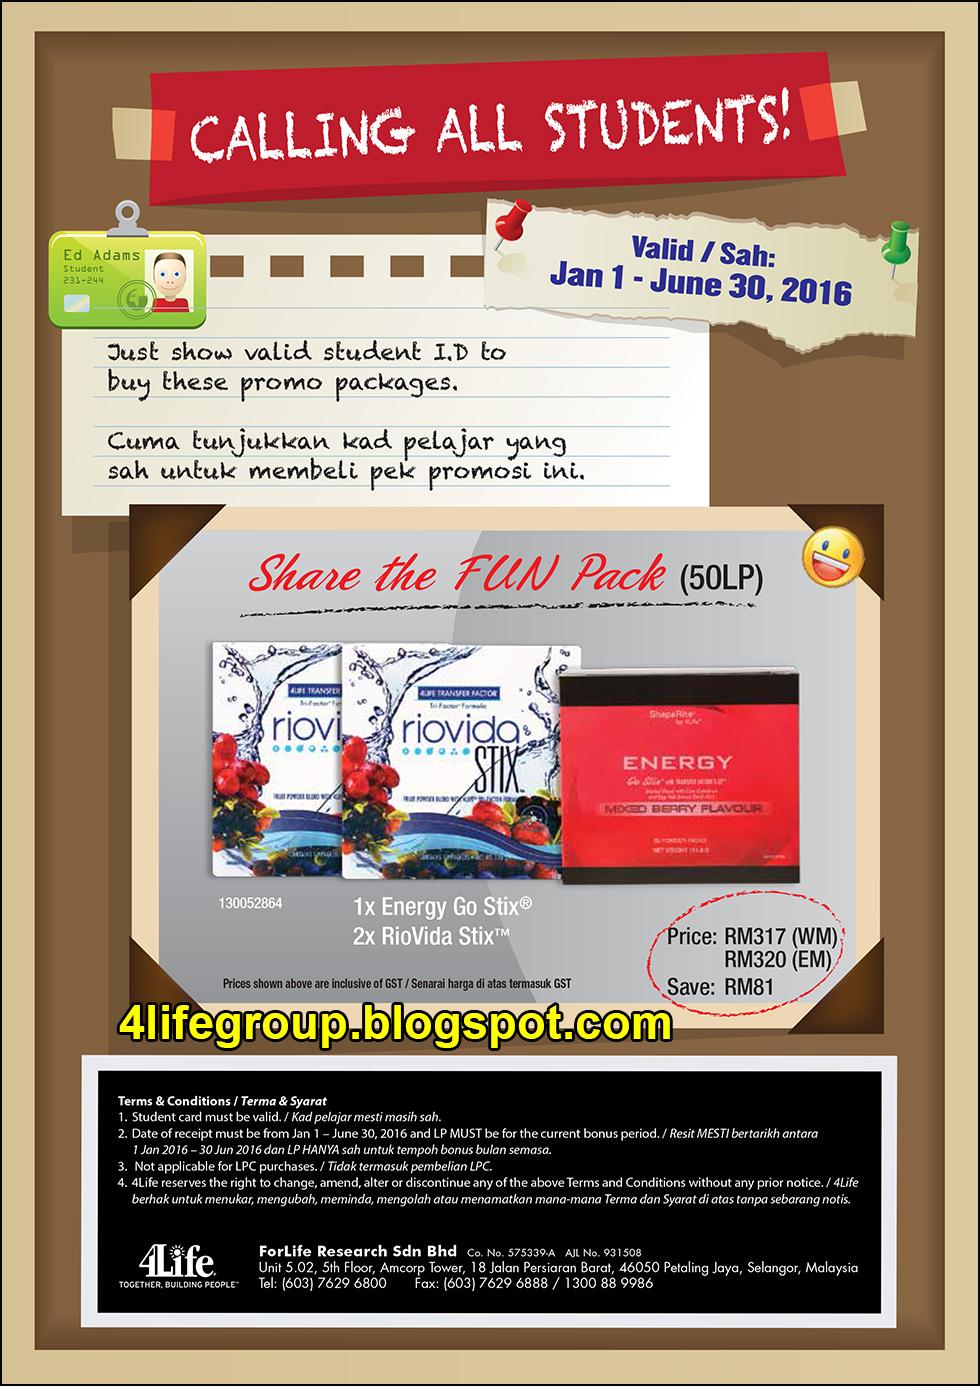 foto Promosi Pakej Pelajar 4Life Malaysia